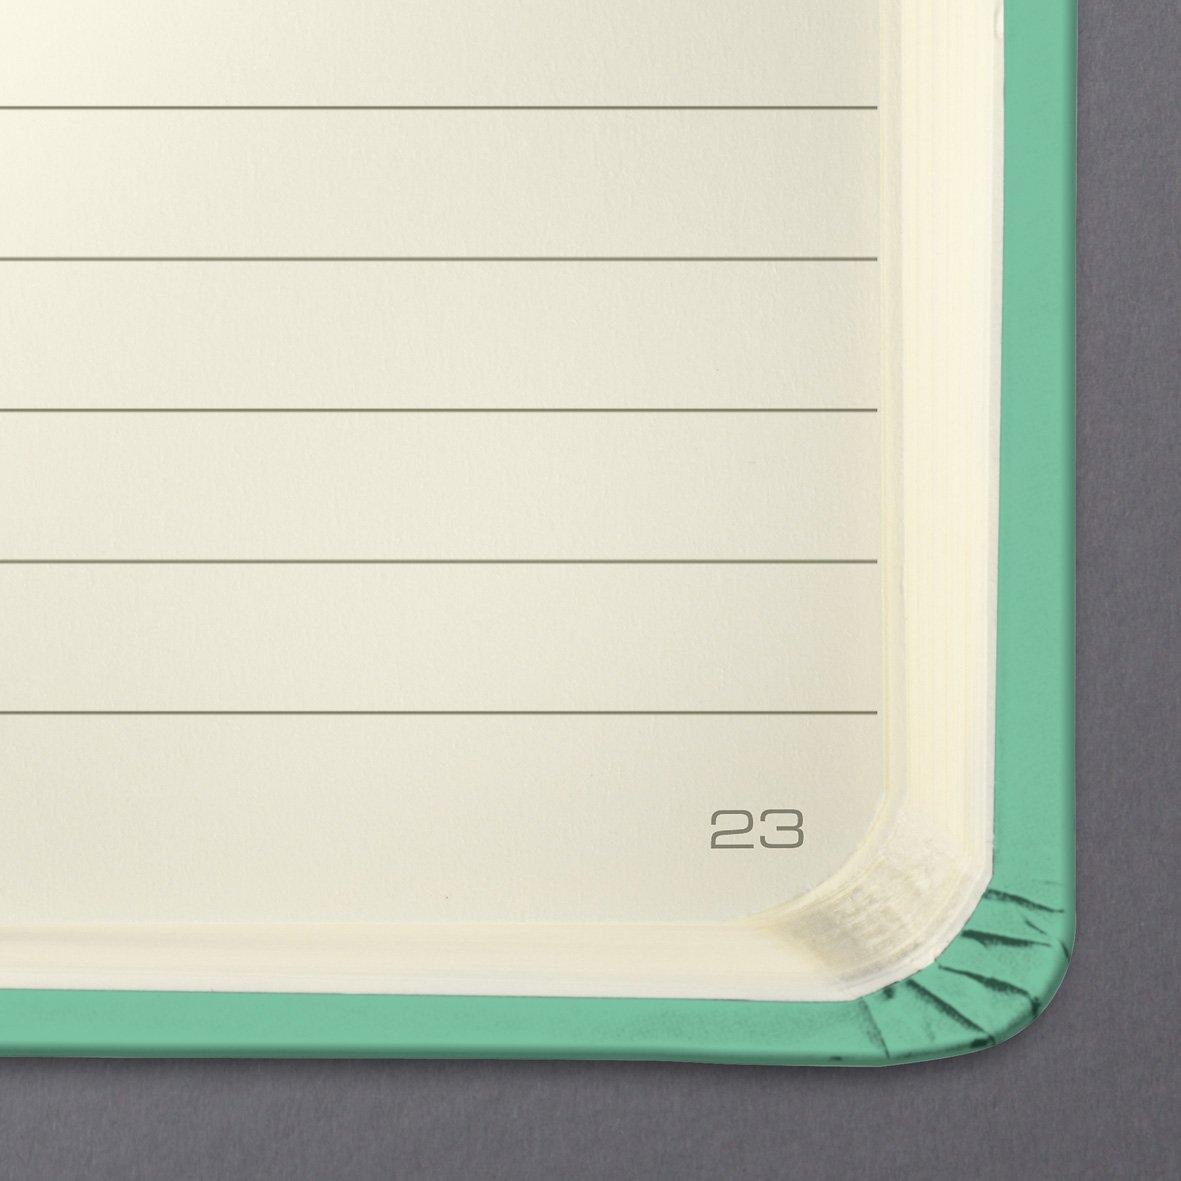 copertina rigida SIGEL CO569 Taccuino Conceptum circa A6 verde mela 194 pagine a quadretti